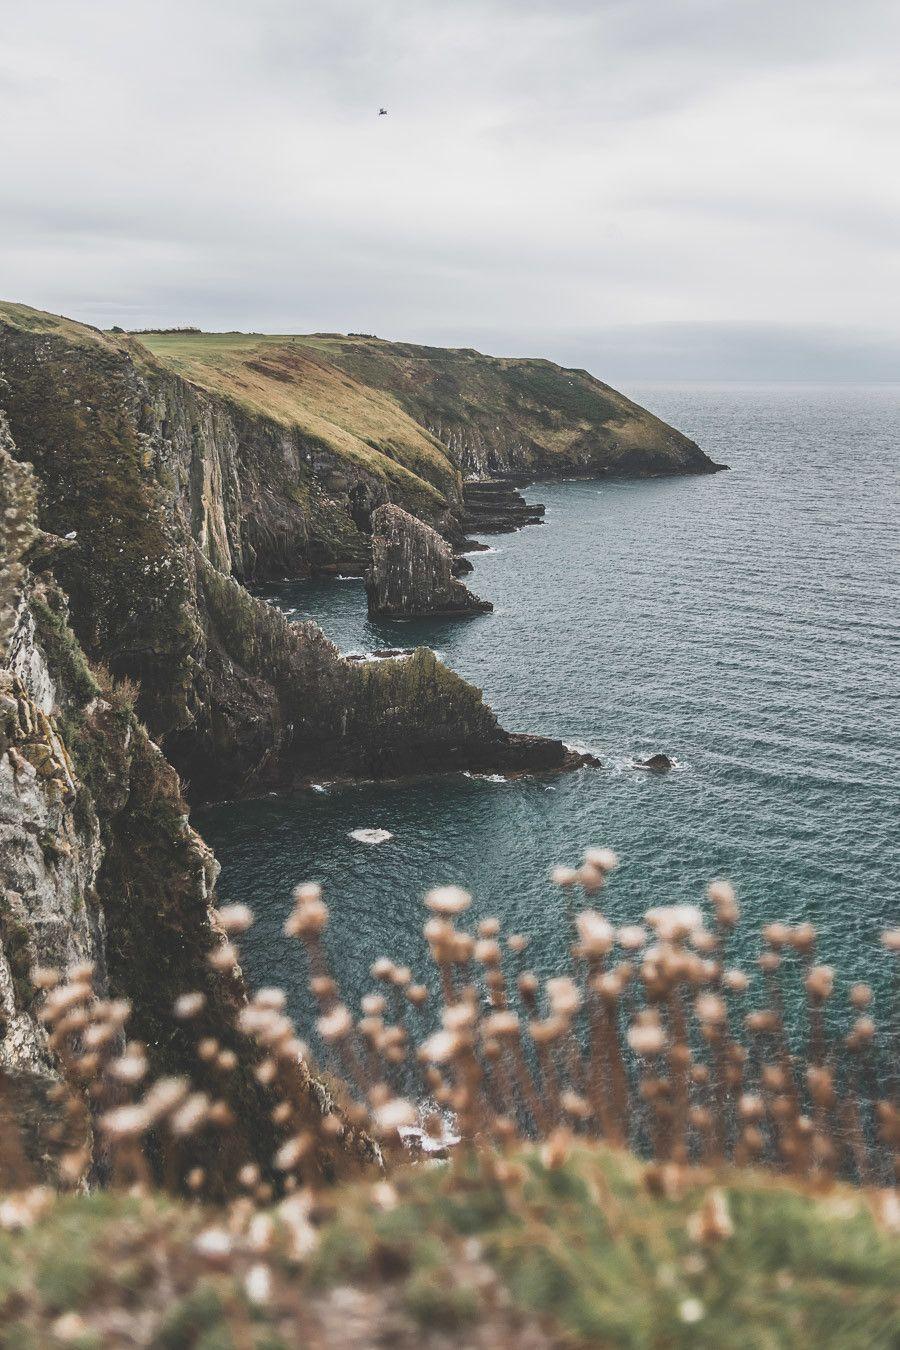 Que Faire En Irlande : faire, irlande, Faire, Comté, Irlande, Paysage,, Irlande,